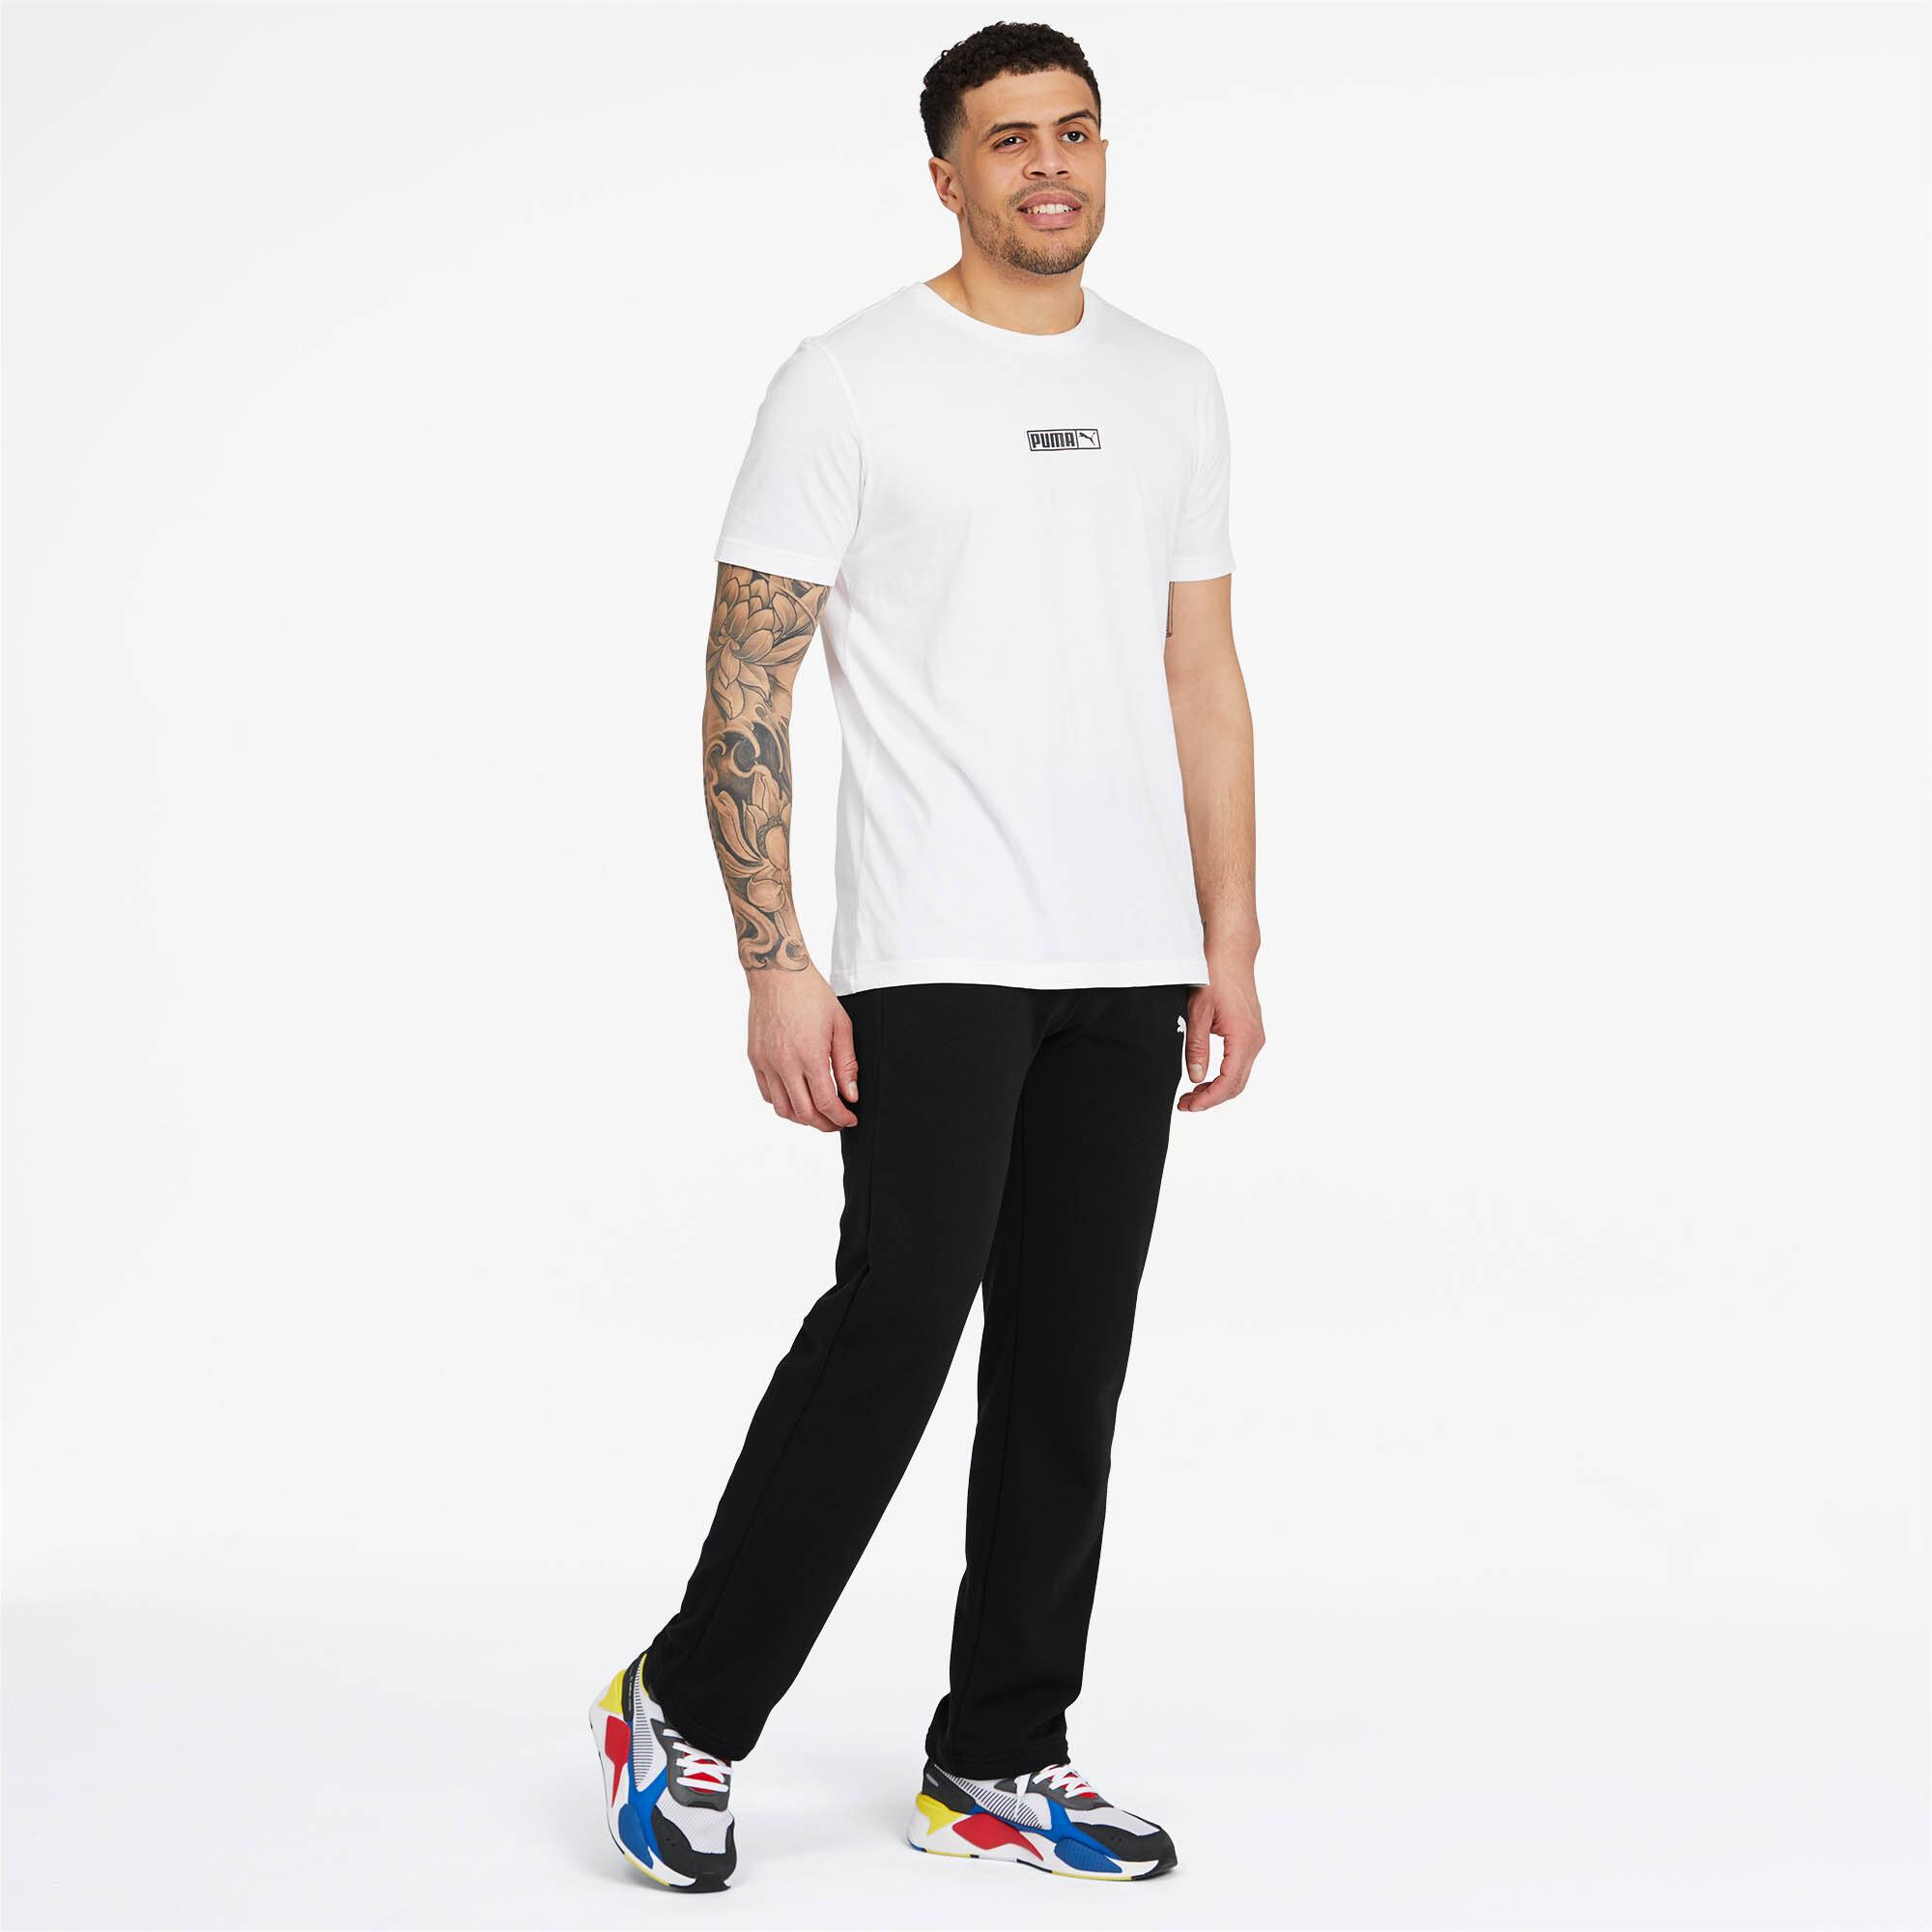 PUMA-Essentials-Men-039-s-Sweatpants-Men-Knitted-Pants-Basics thumbnail 6